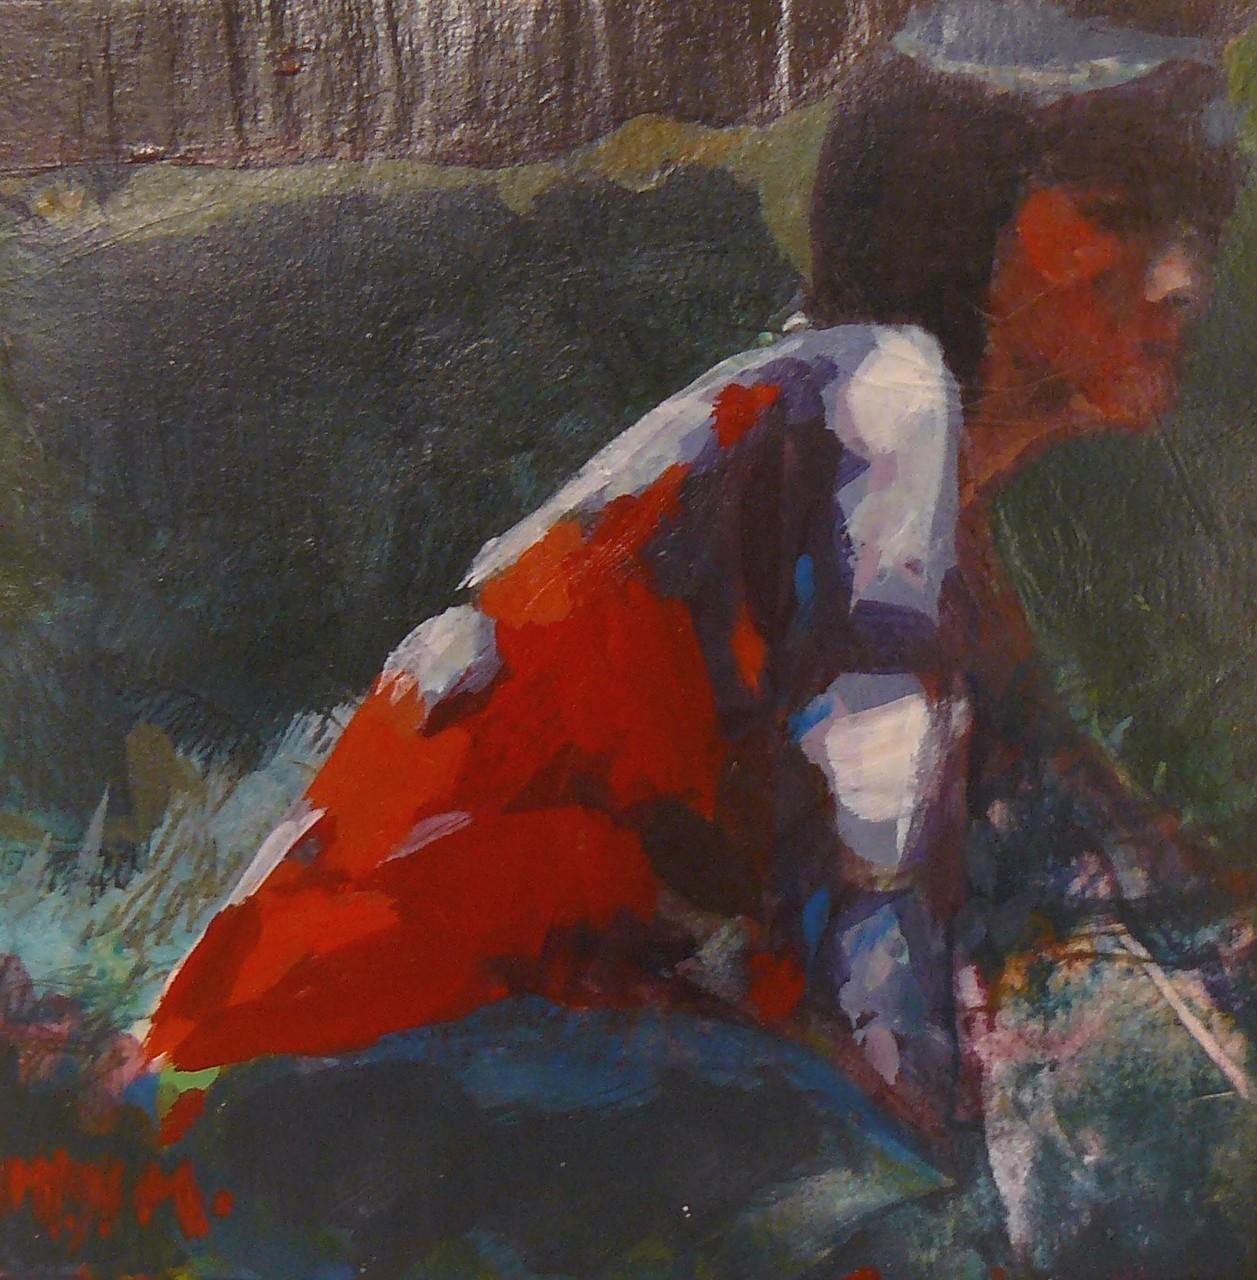 Jeune fille au pull rouge